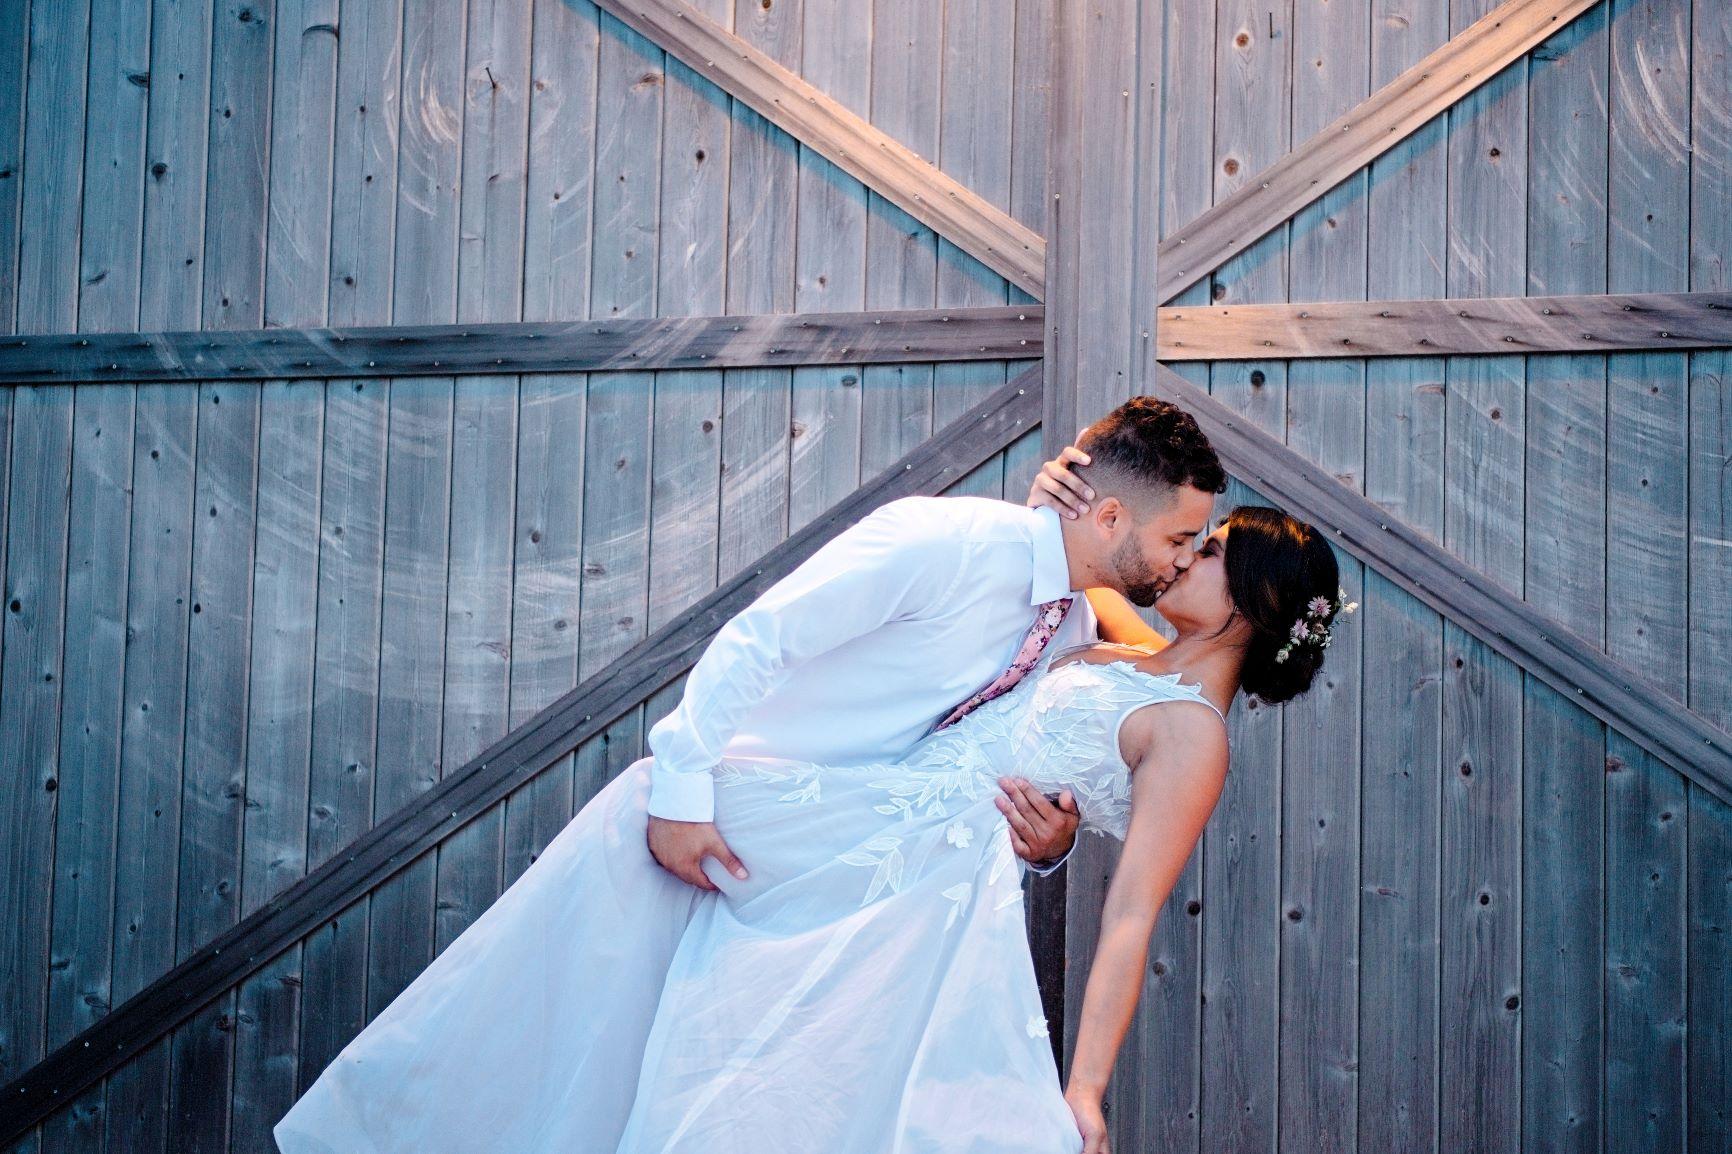 molly hanlon studio - cardiff wedding photography- london wedding photography - elopement photographer - creative wedding photographer- creative couples portrait